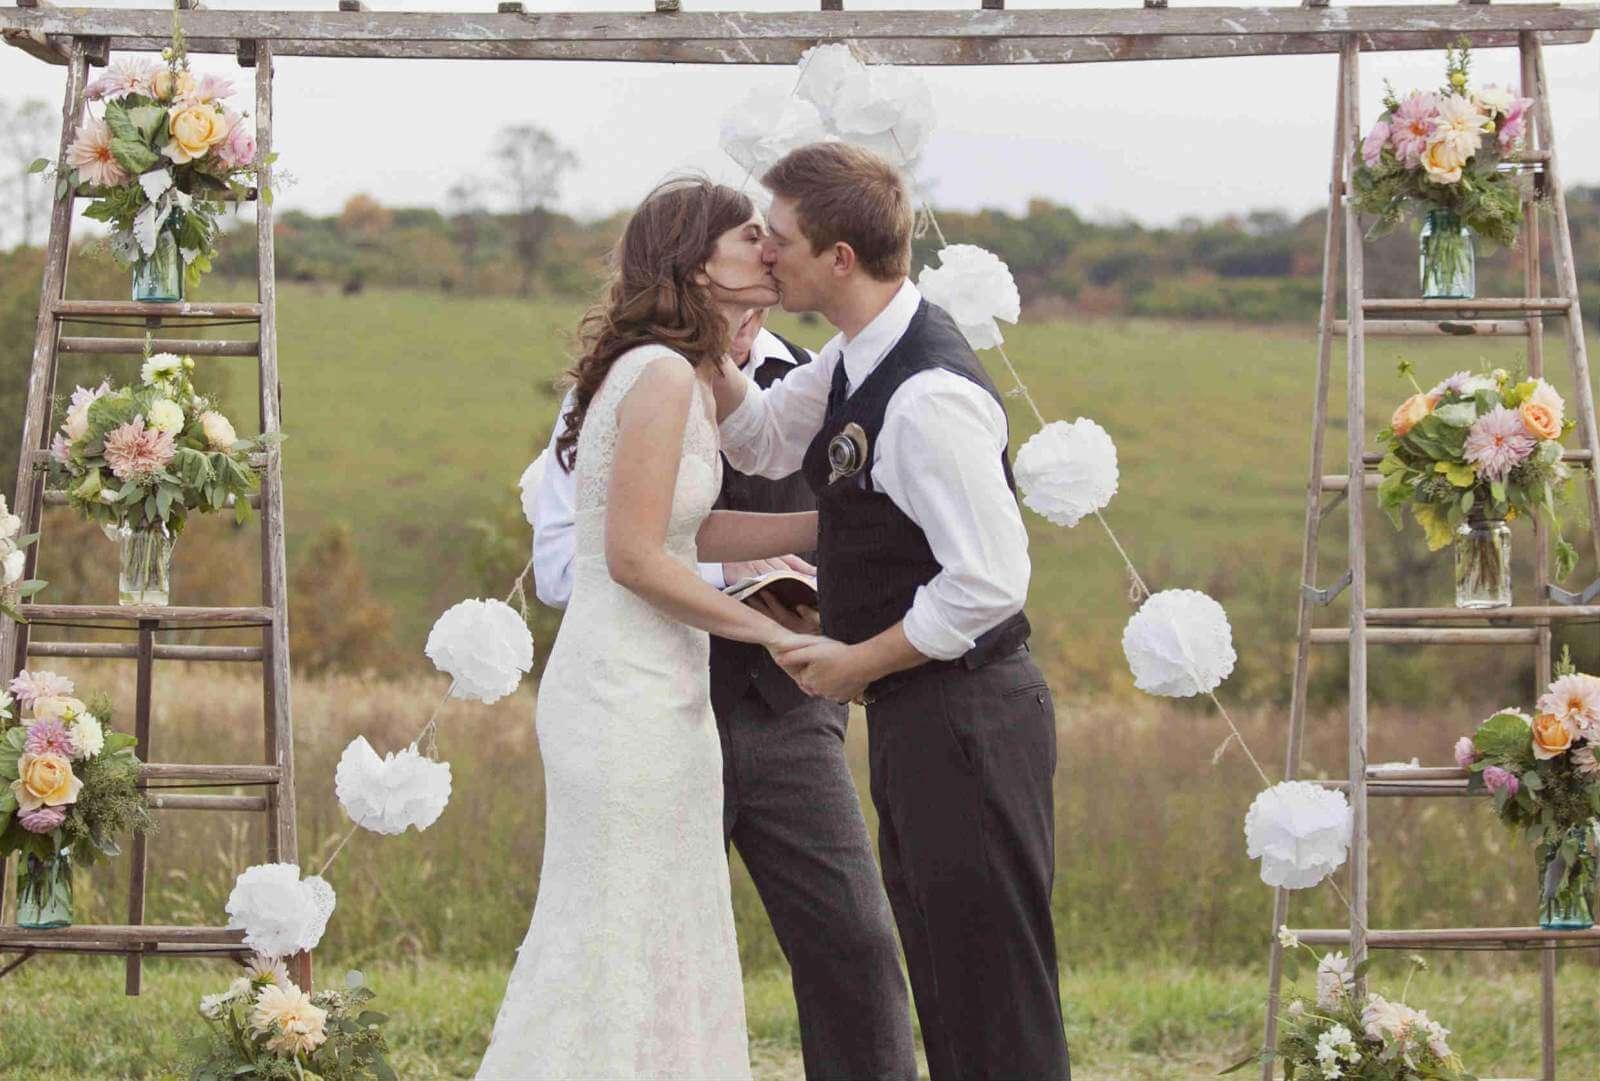 Deluxe Tips Shutterfly Small Wedding Ideas Michigan Small Wedding Ideas California Bride Groom Kiss Backyard Wedding Intimate Small Wedding Ideas ideas Small Wedding Ideas